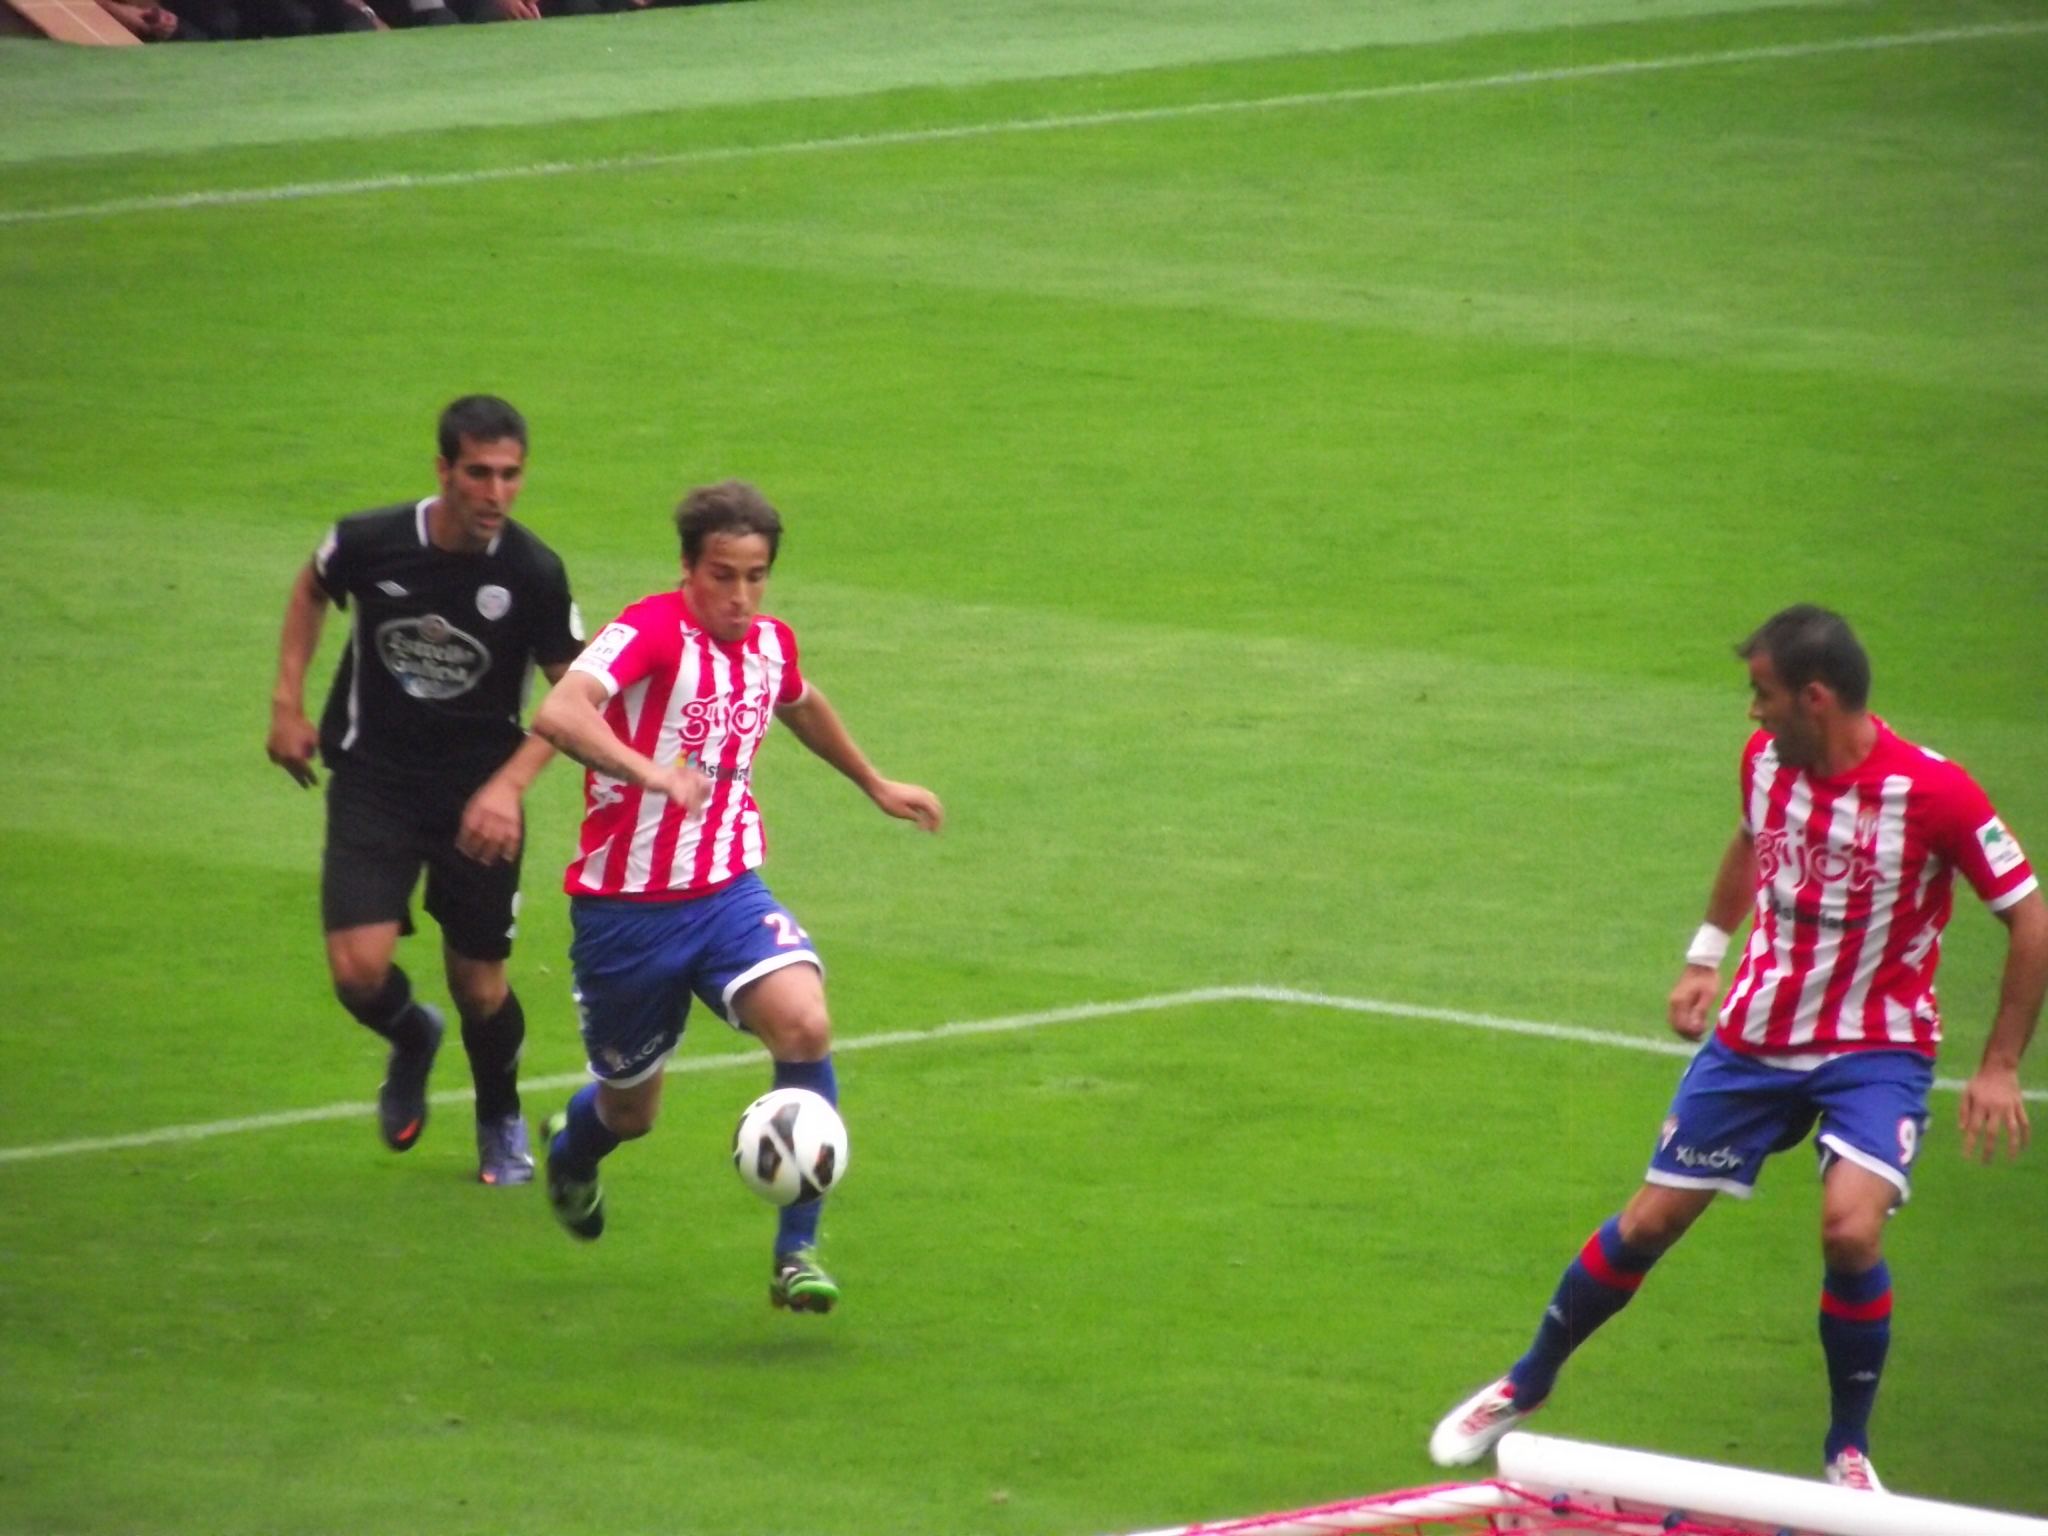 Sporting - Mirandés, puntuaciones del partido de Copa del Rey